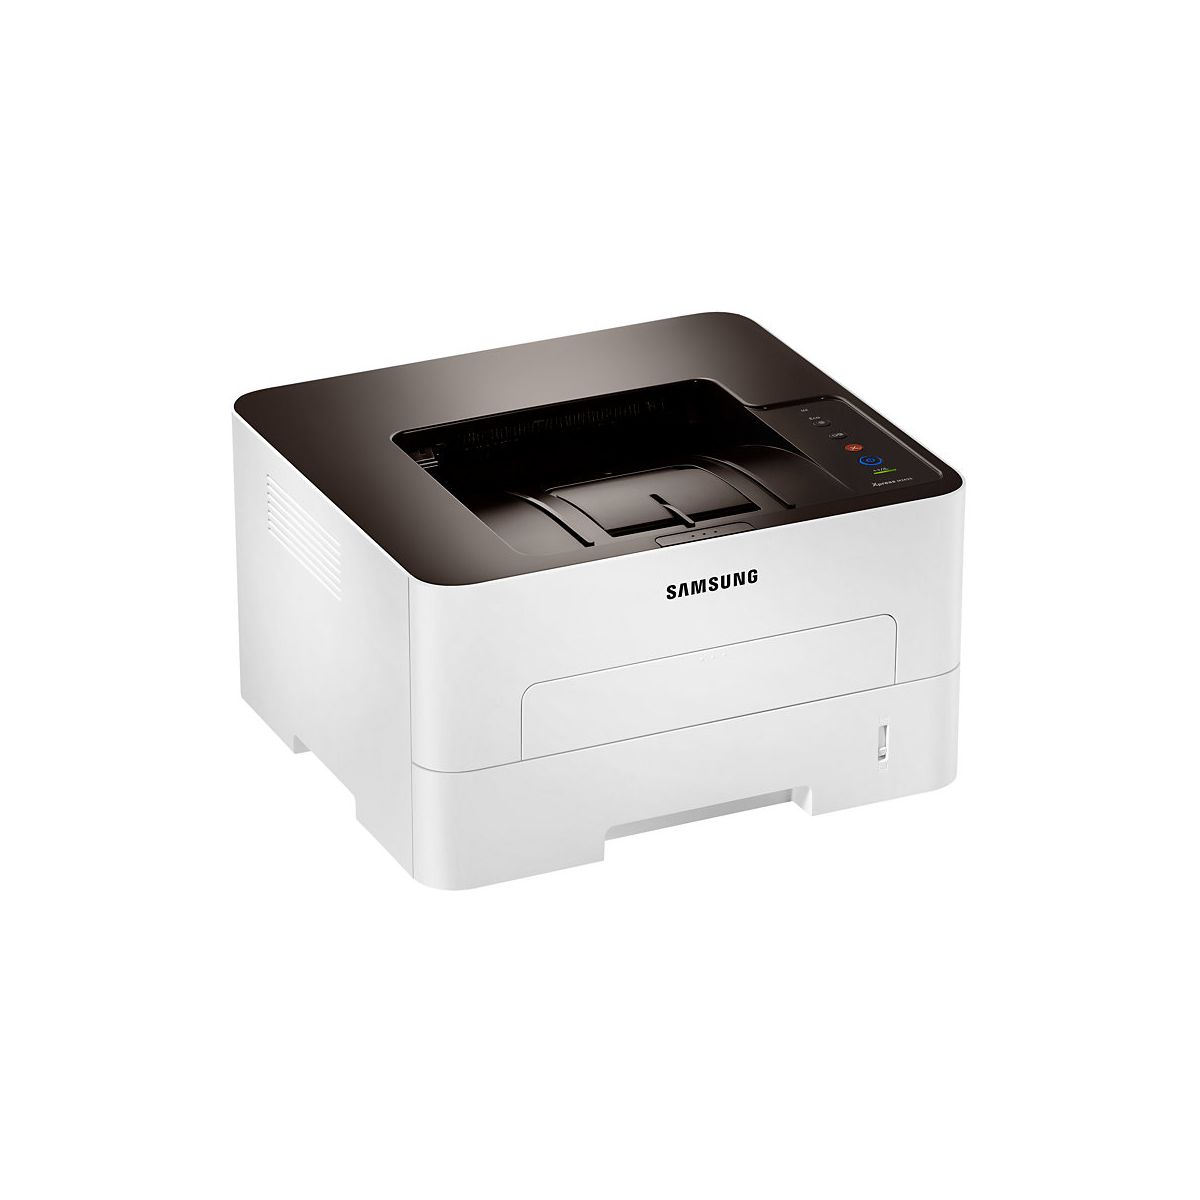 Imprimante monofonction laser monochrome SAMSUNG SL-M2825ND (photo)